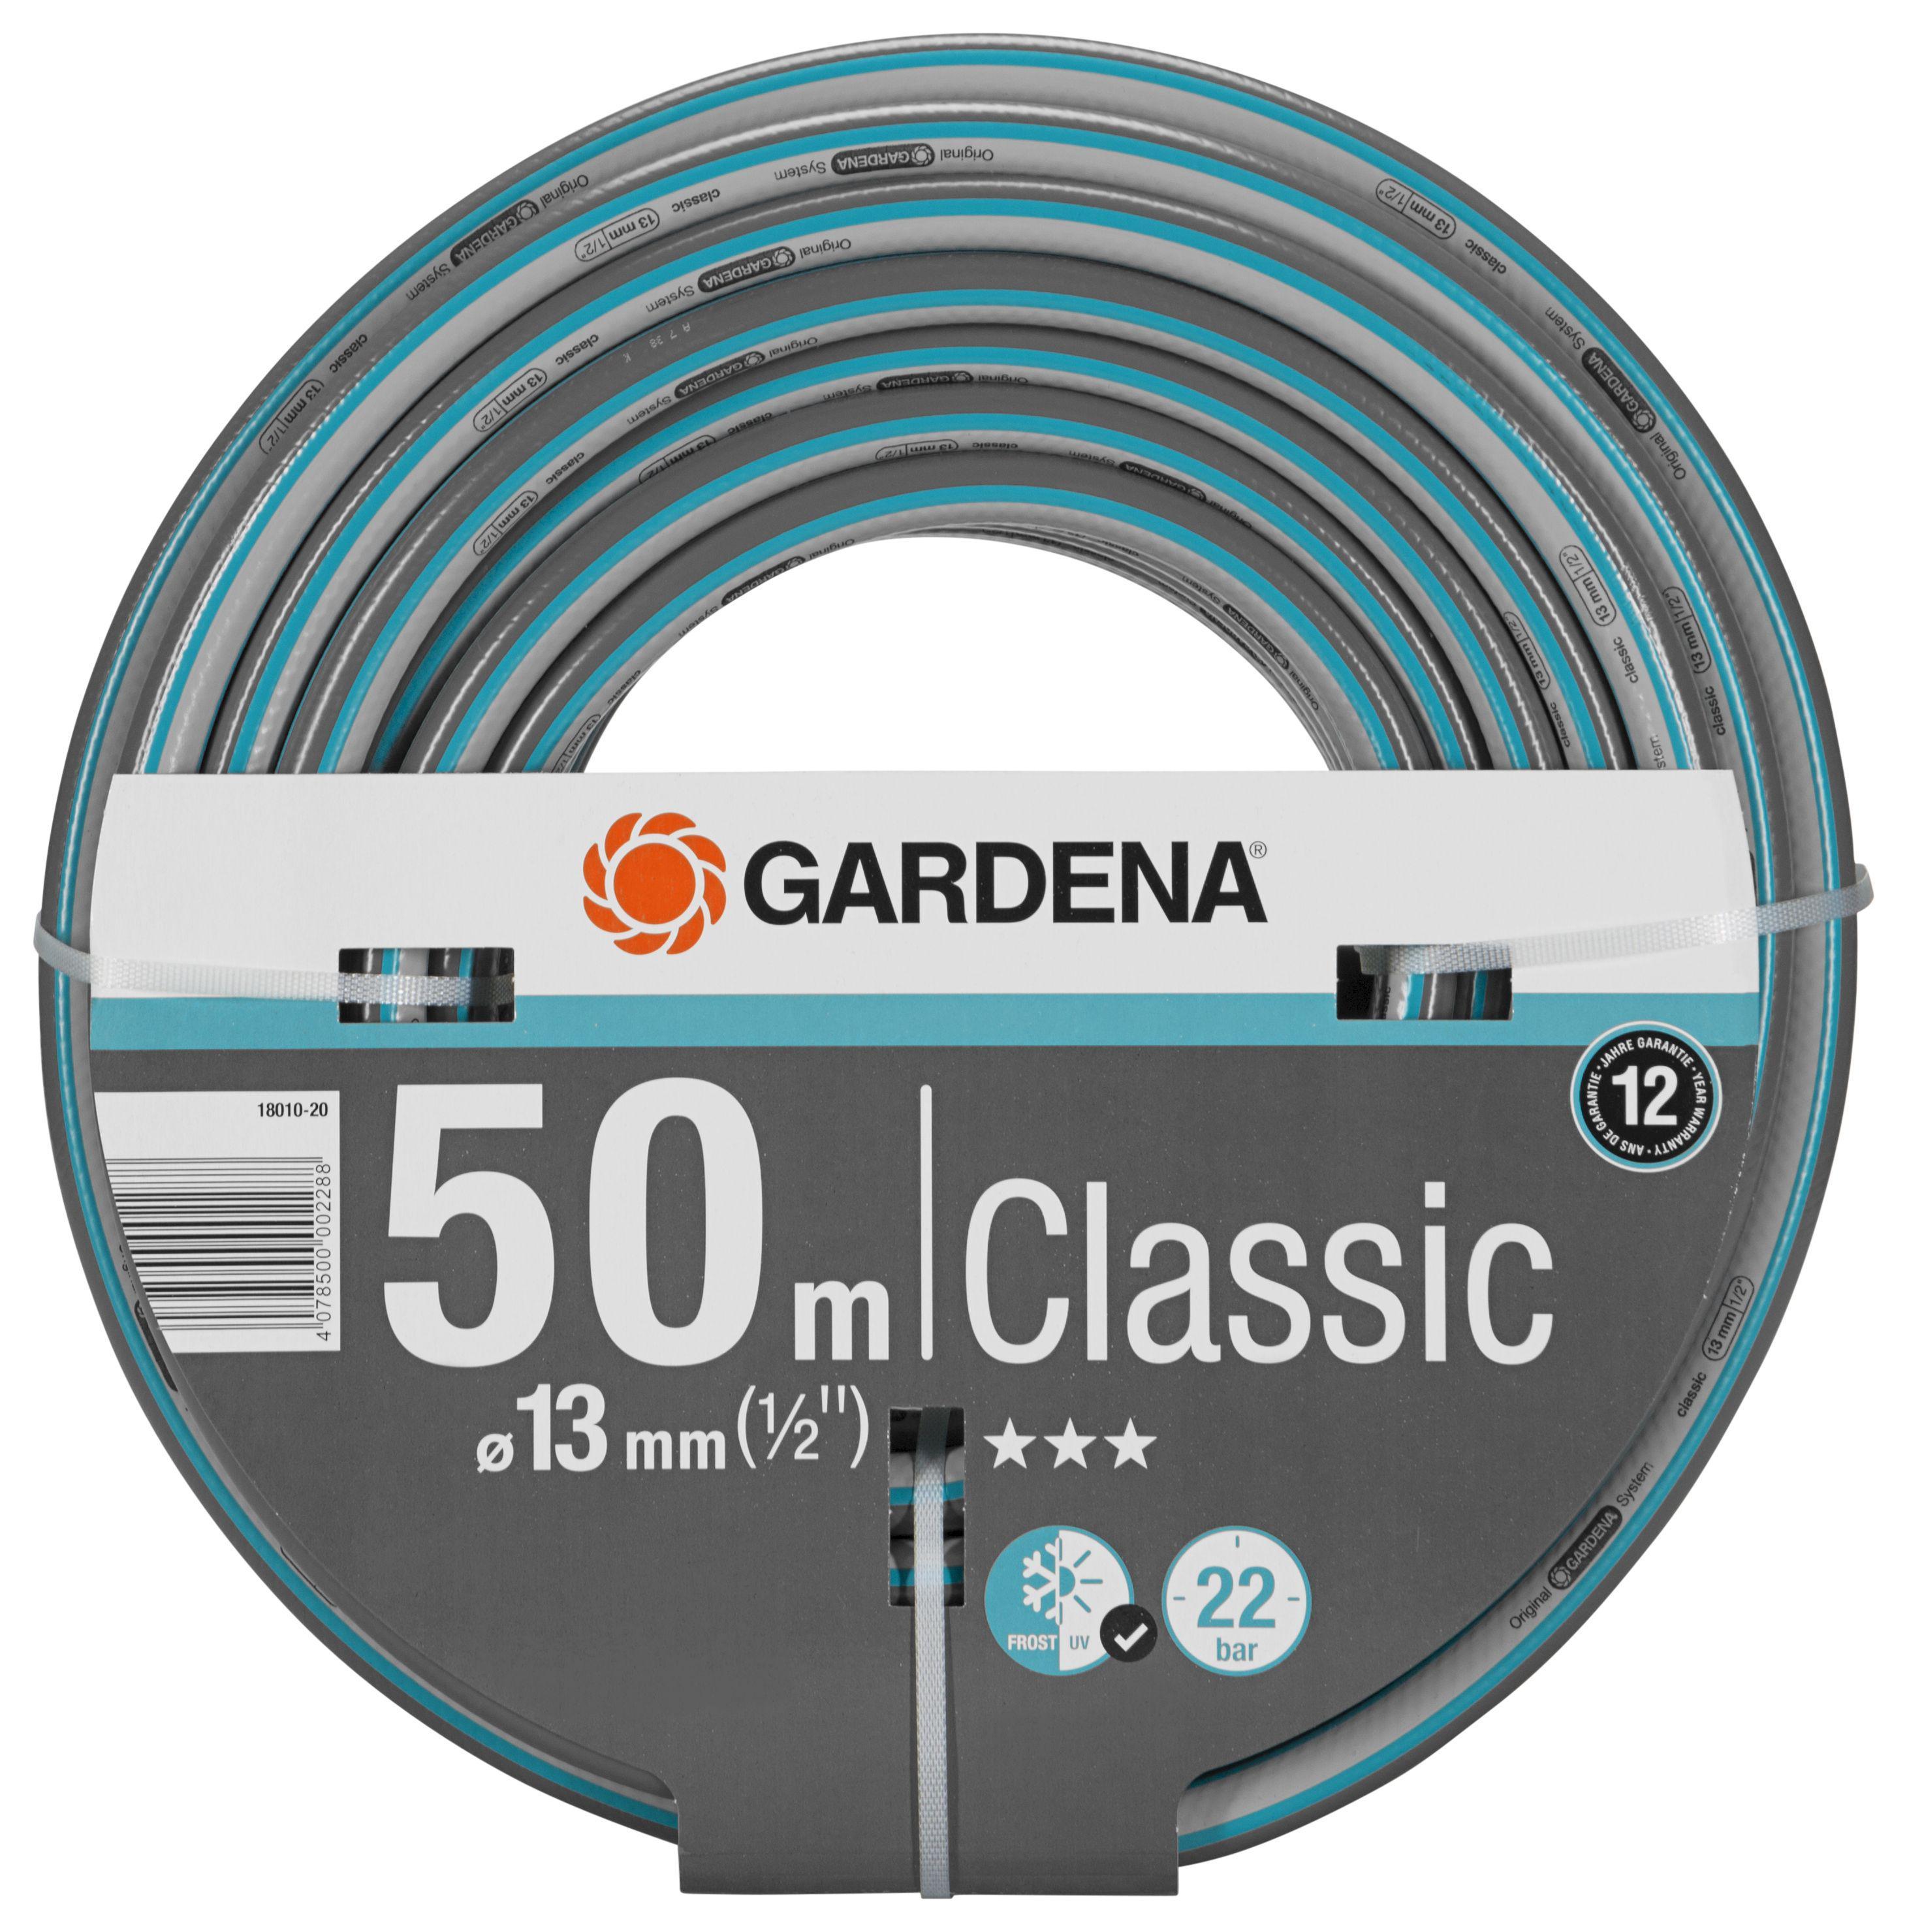 Шланг Gardena Classic 18010 длина 50м диаметр 13мм (1/2'') 22бар (18010-20.000.00) цена и фото